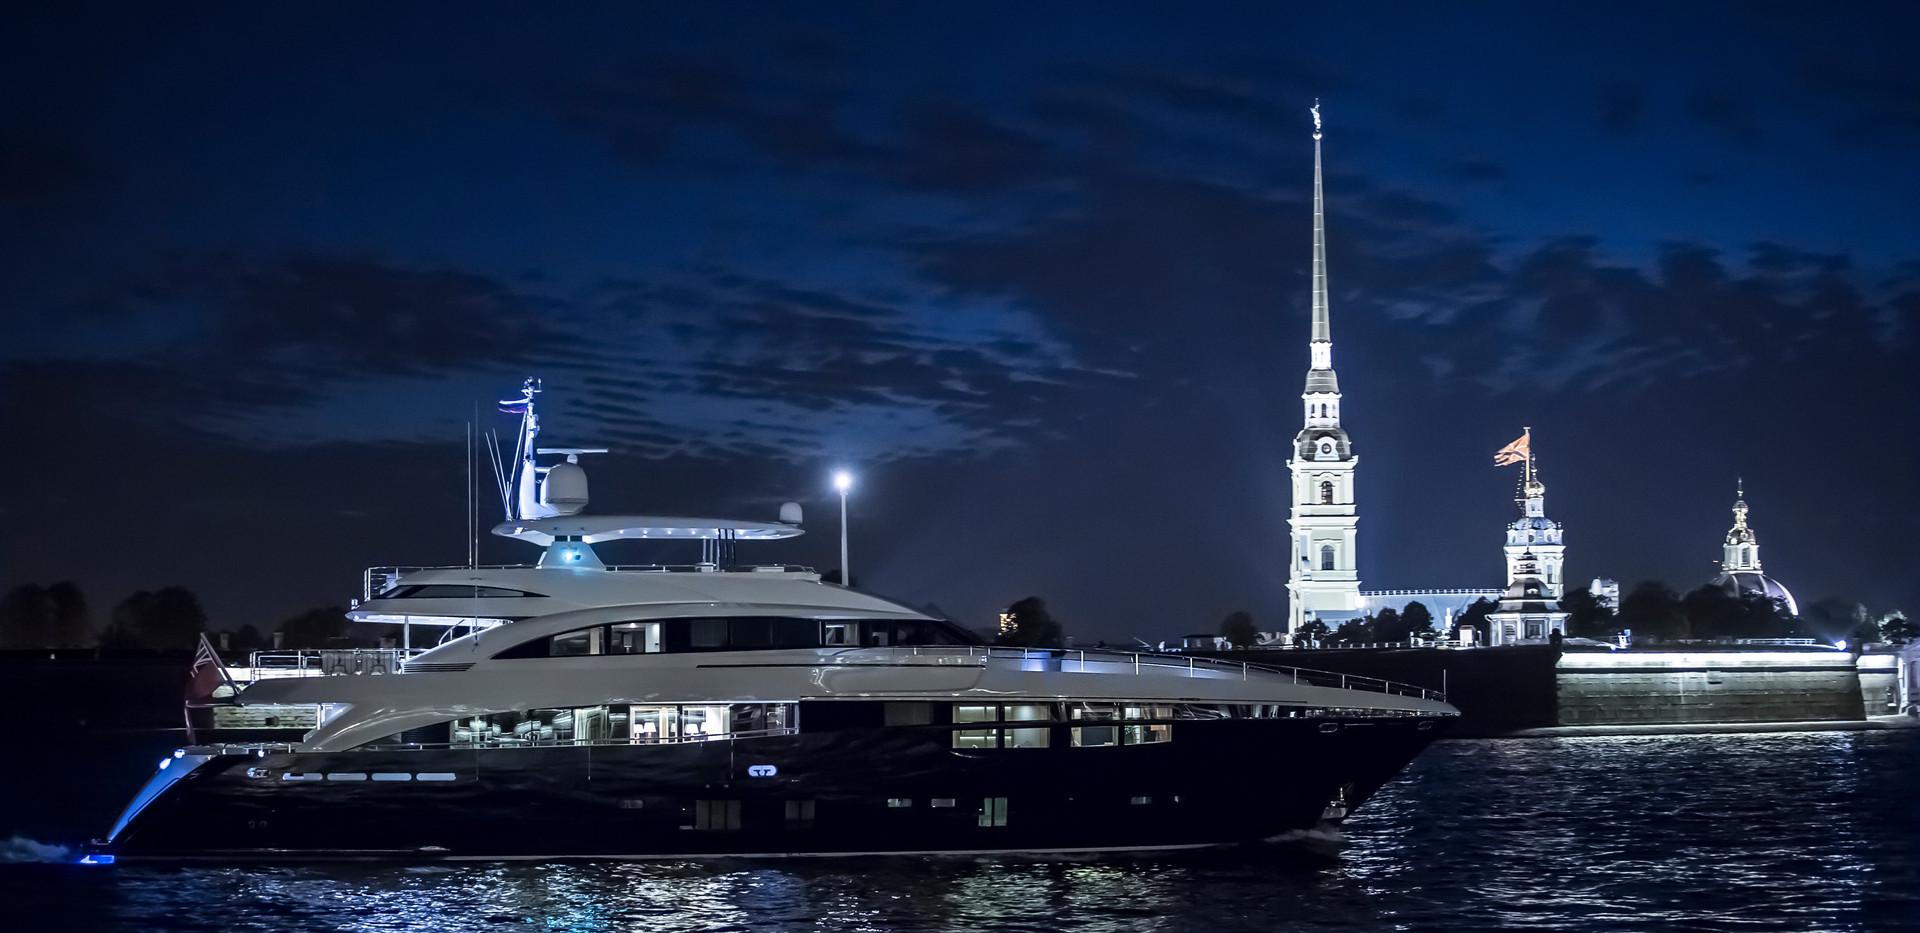 40m-exterior-blue-hull-flying-fish-2Abro